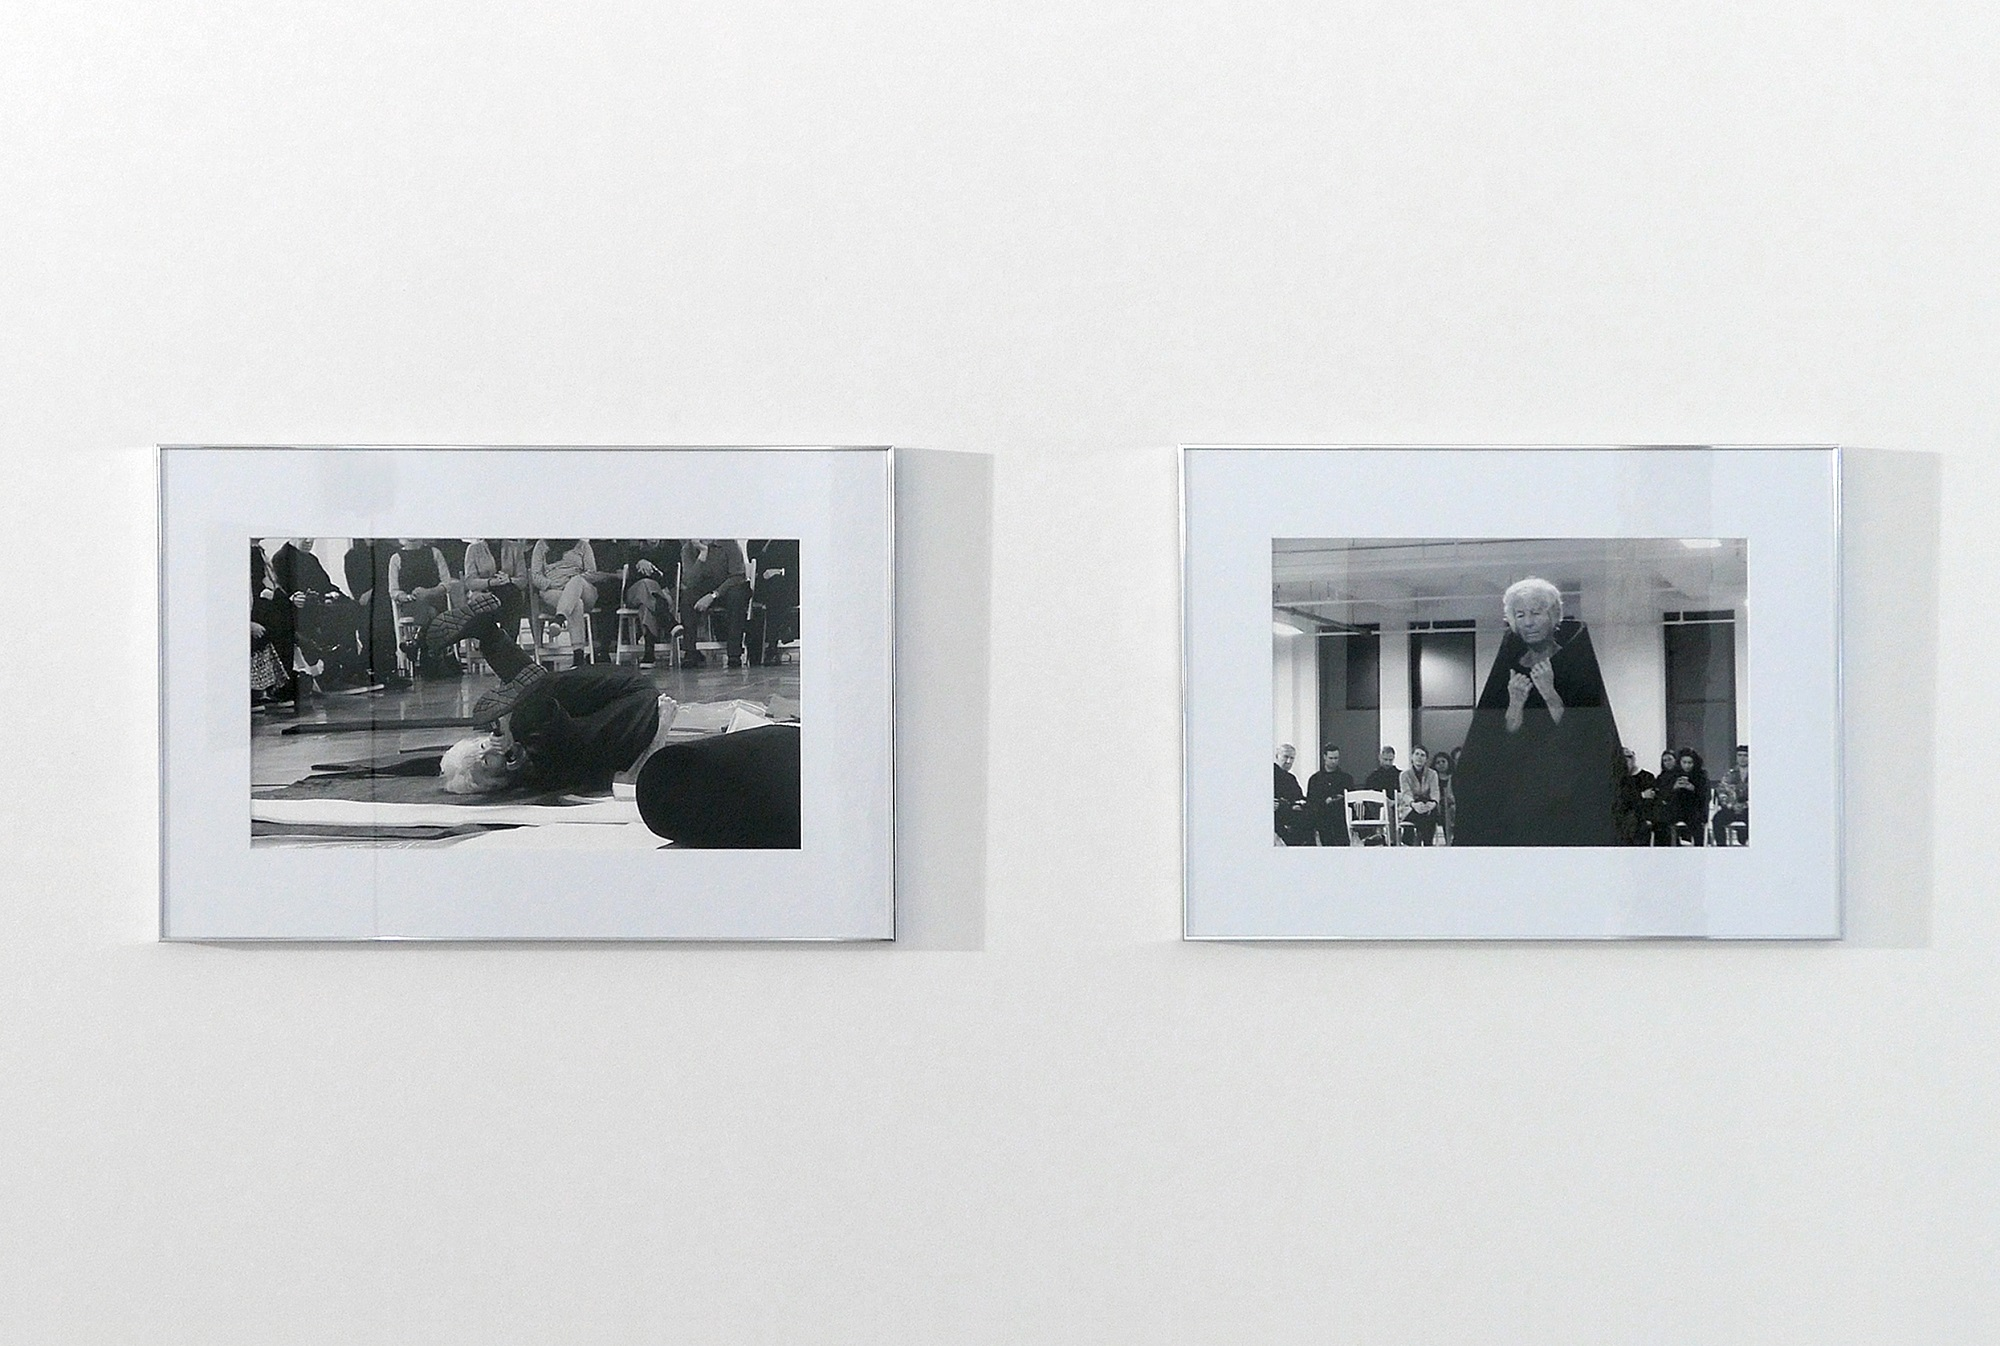 Simone Forti, Léo Castelli Gallery, NY Février 2018 - Marie Angeletti